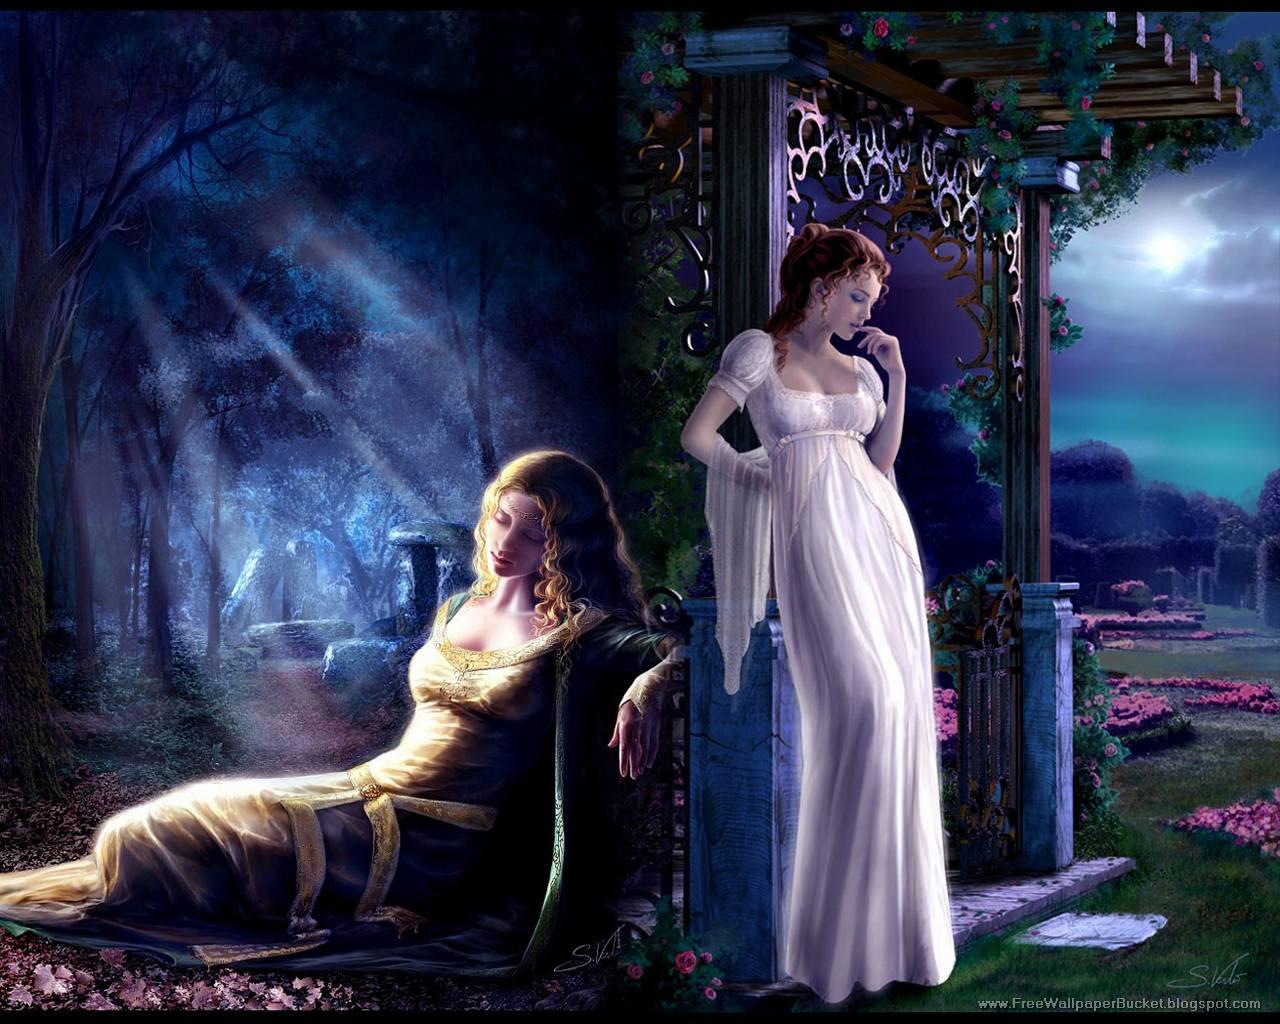 Lindsay: 10 Most Beautiful Fantasy Girls Wallpapers Gallery 03